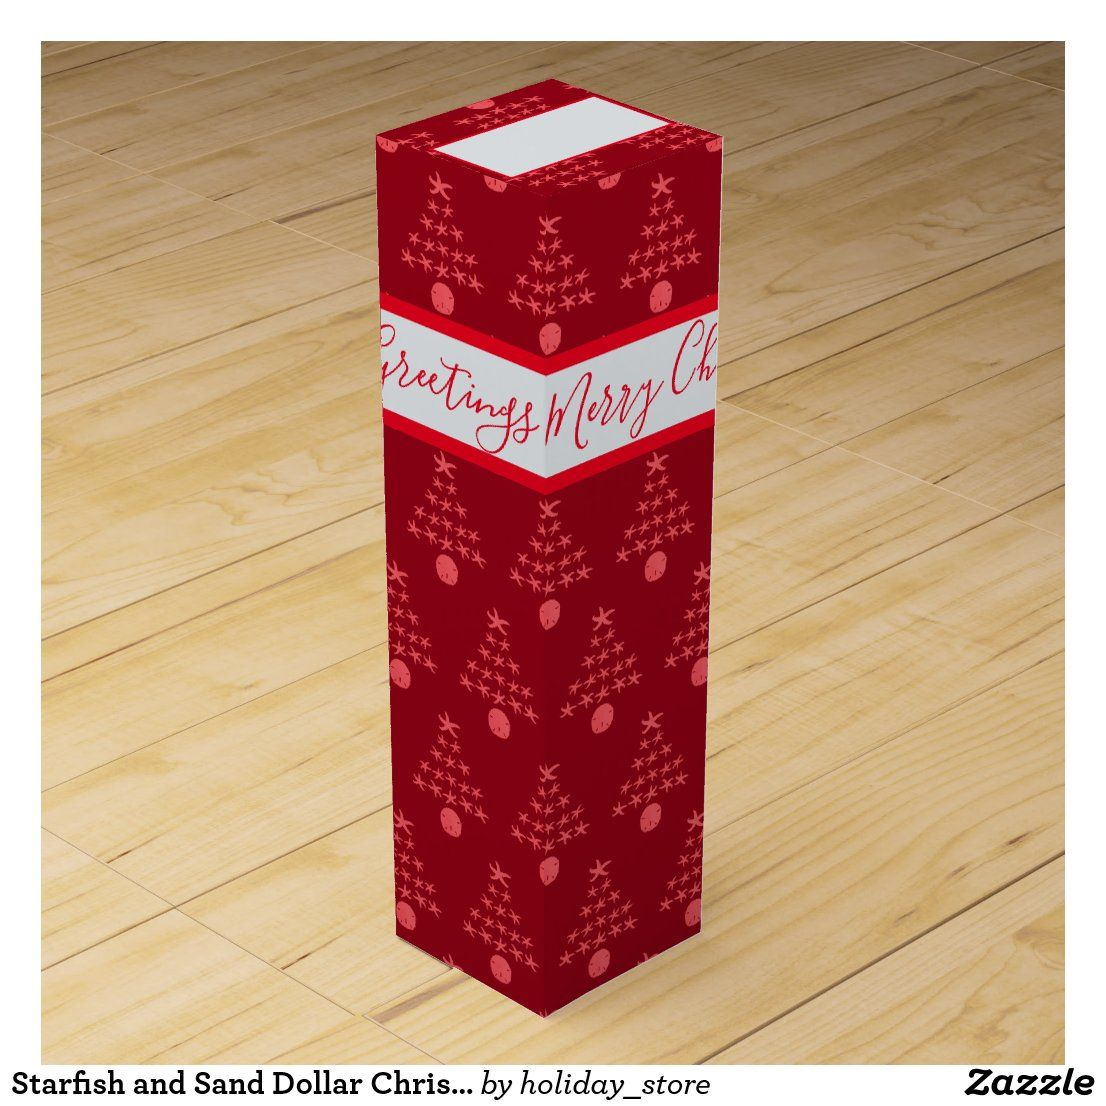 Starfish And Sand Dollar Christmas Trees Pattern Wine Box Zazzle Com In 2020 Custom Wine Box Christmas Tree Pattern Wine Gift Boxes